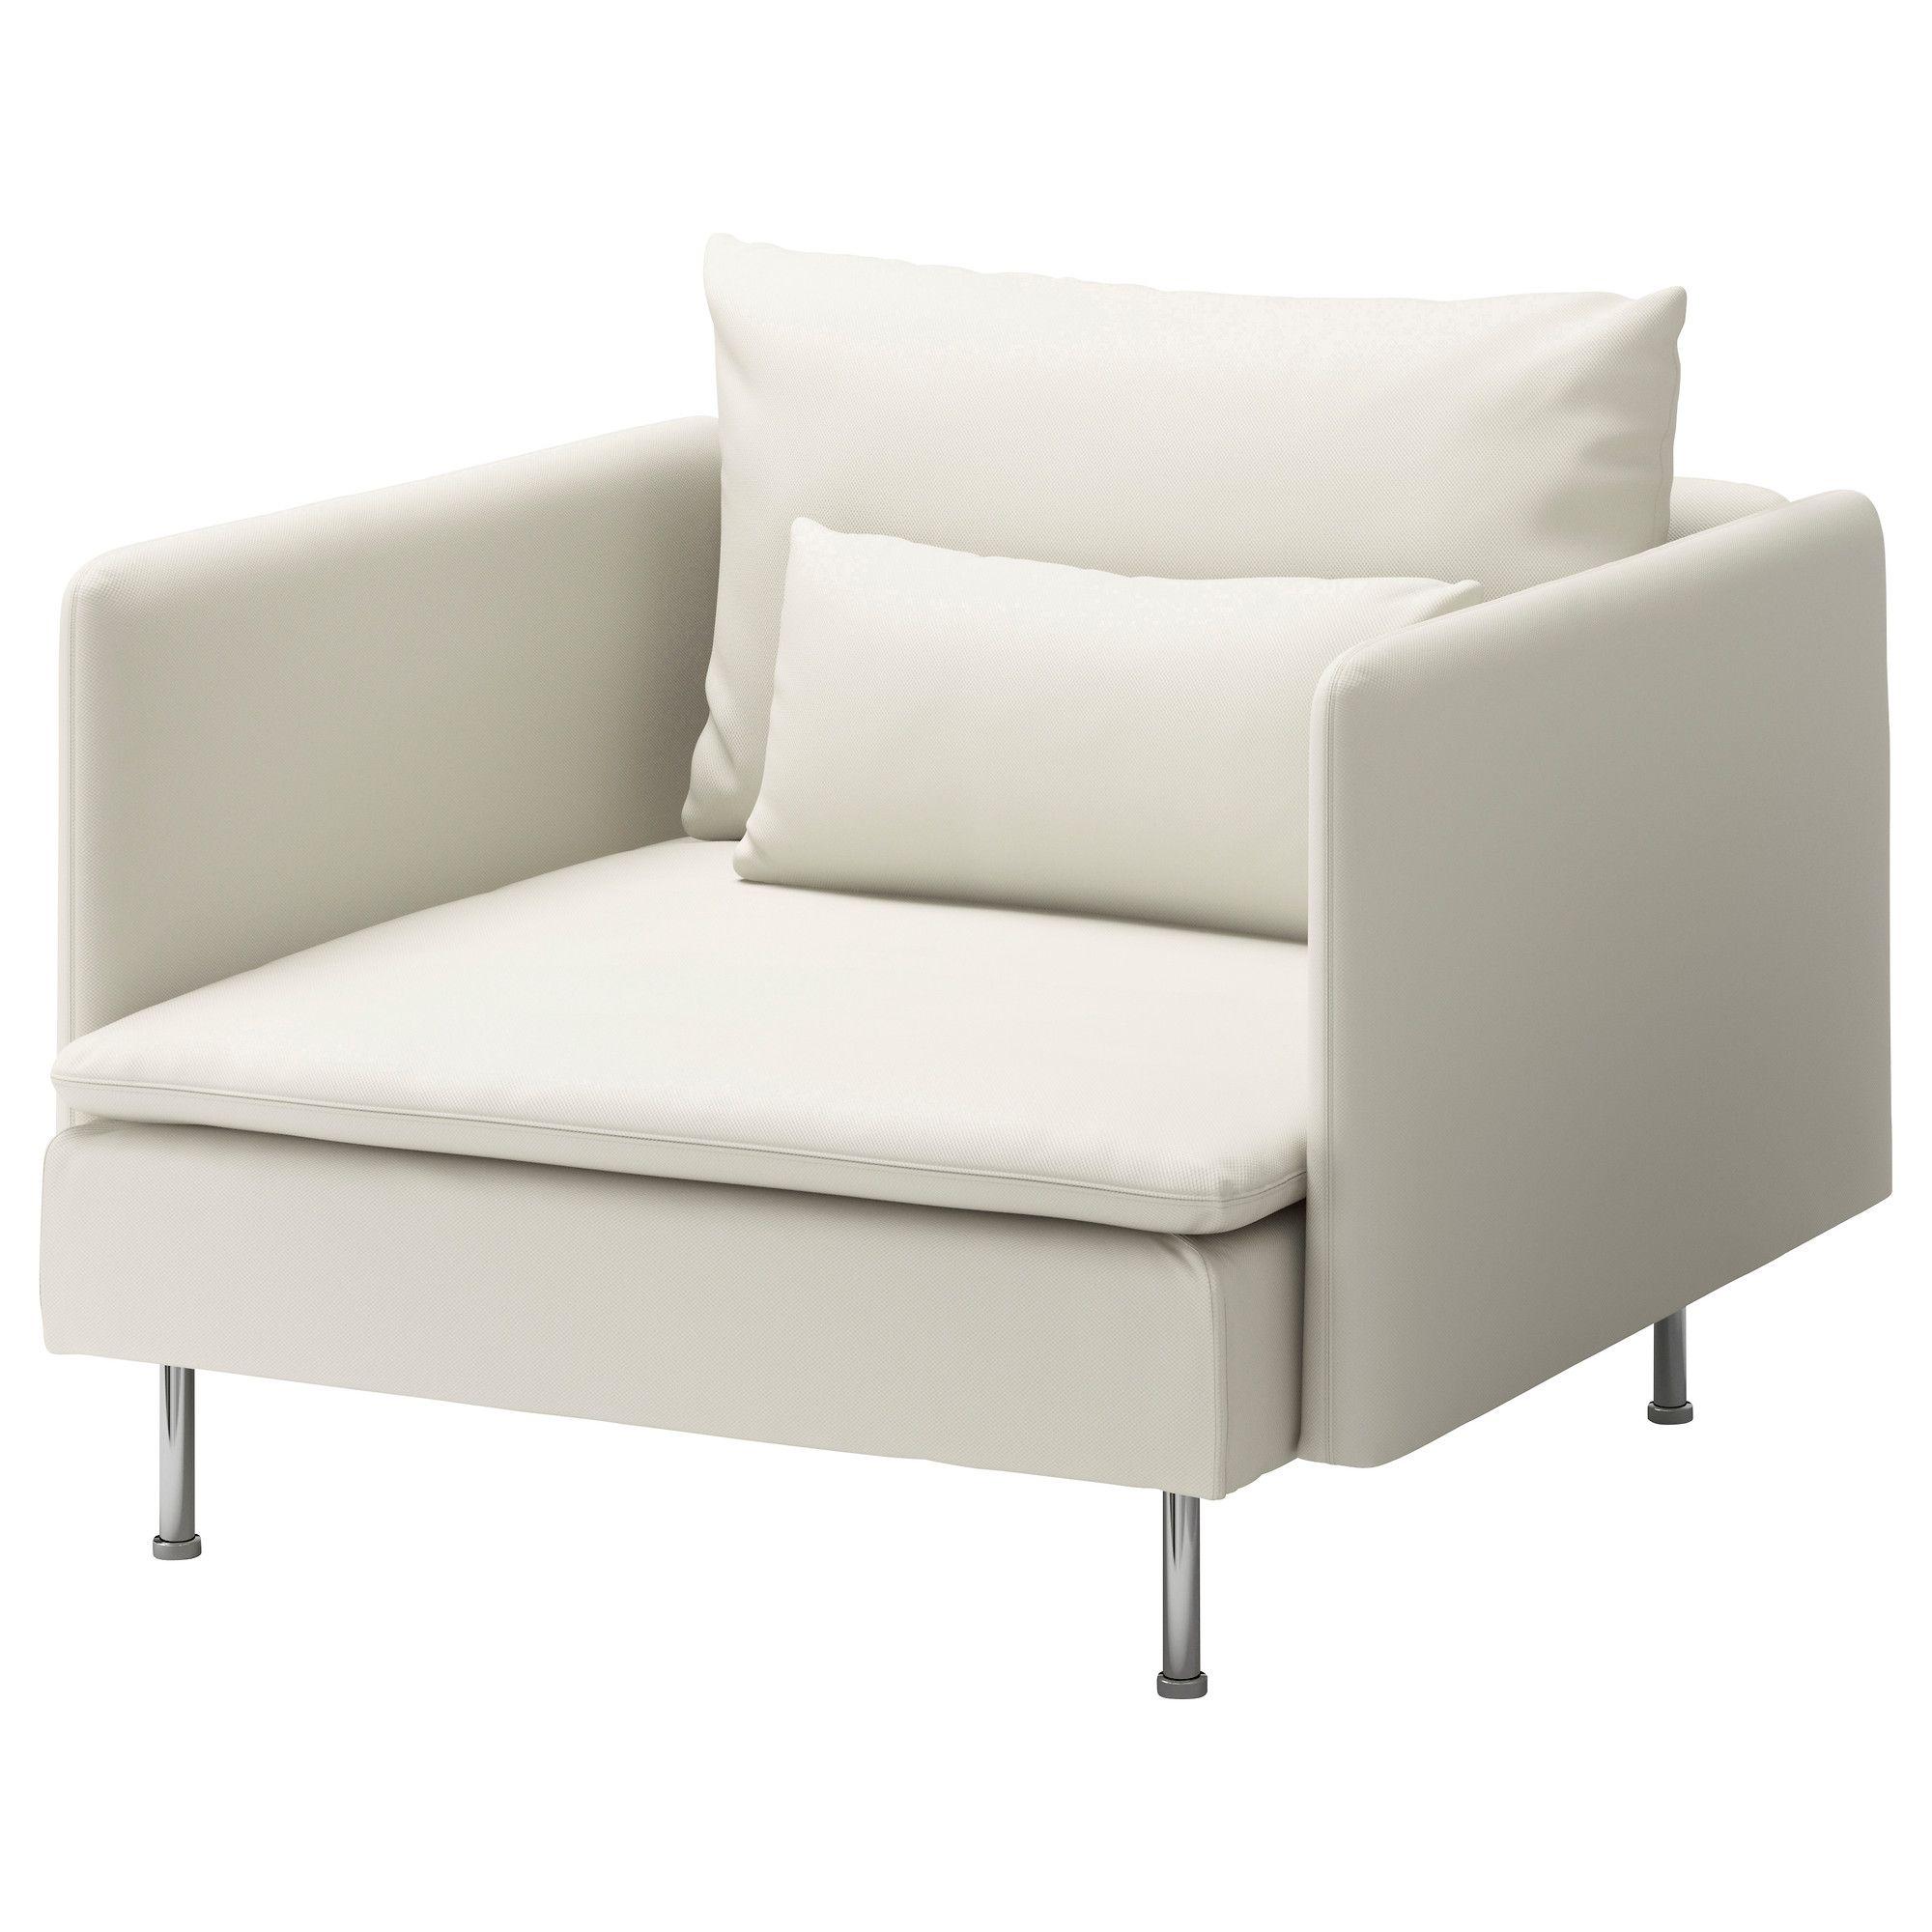 SÖDERHAMN Lenestol - Gräsbo hvit - IKEA